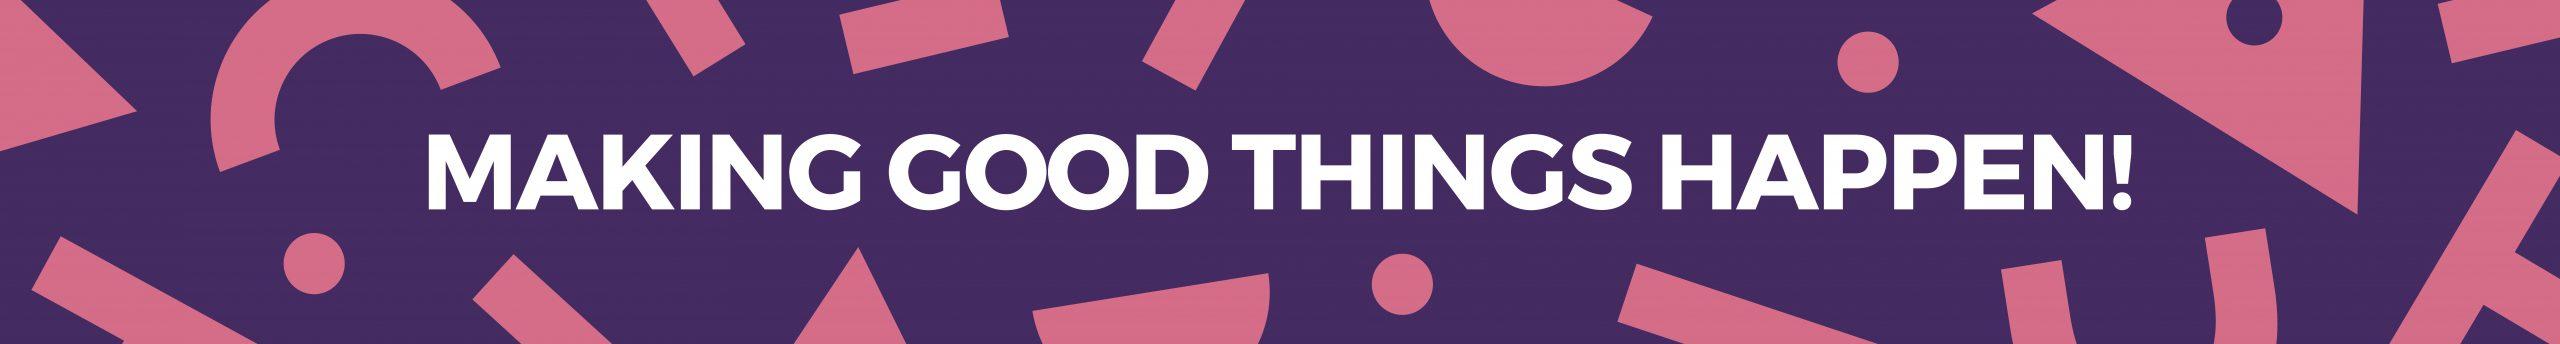 making good things happen banner